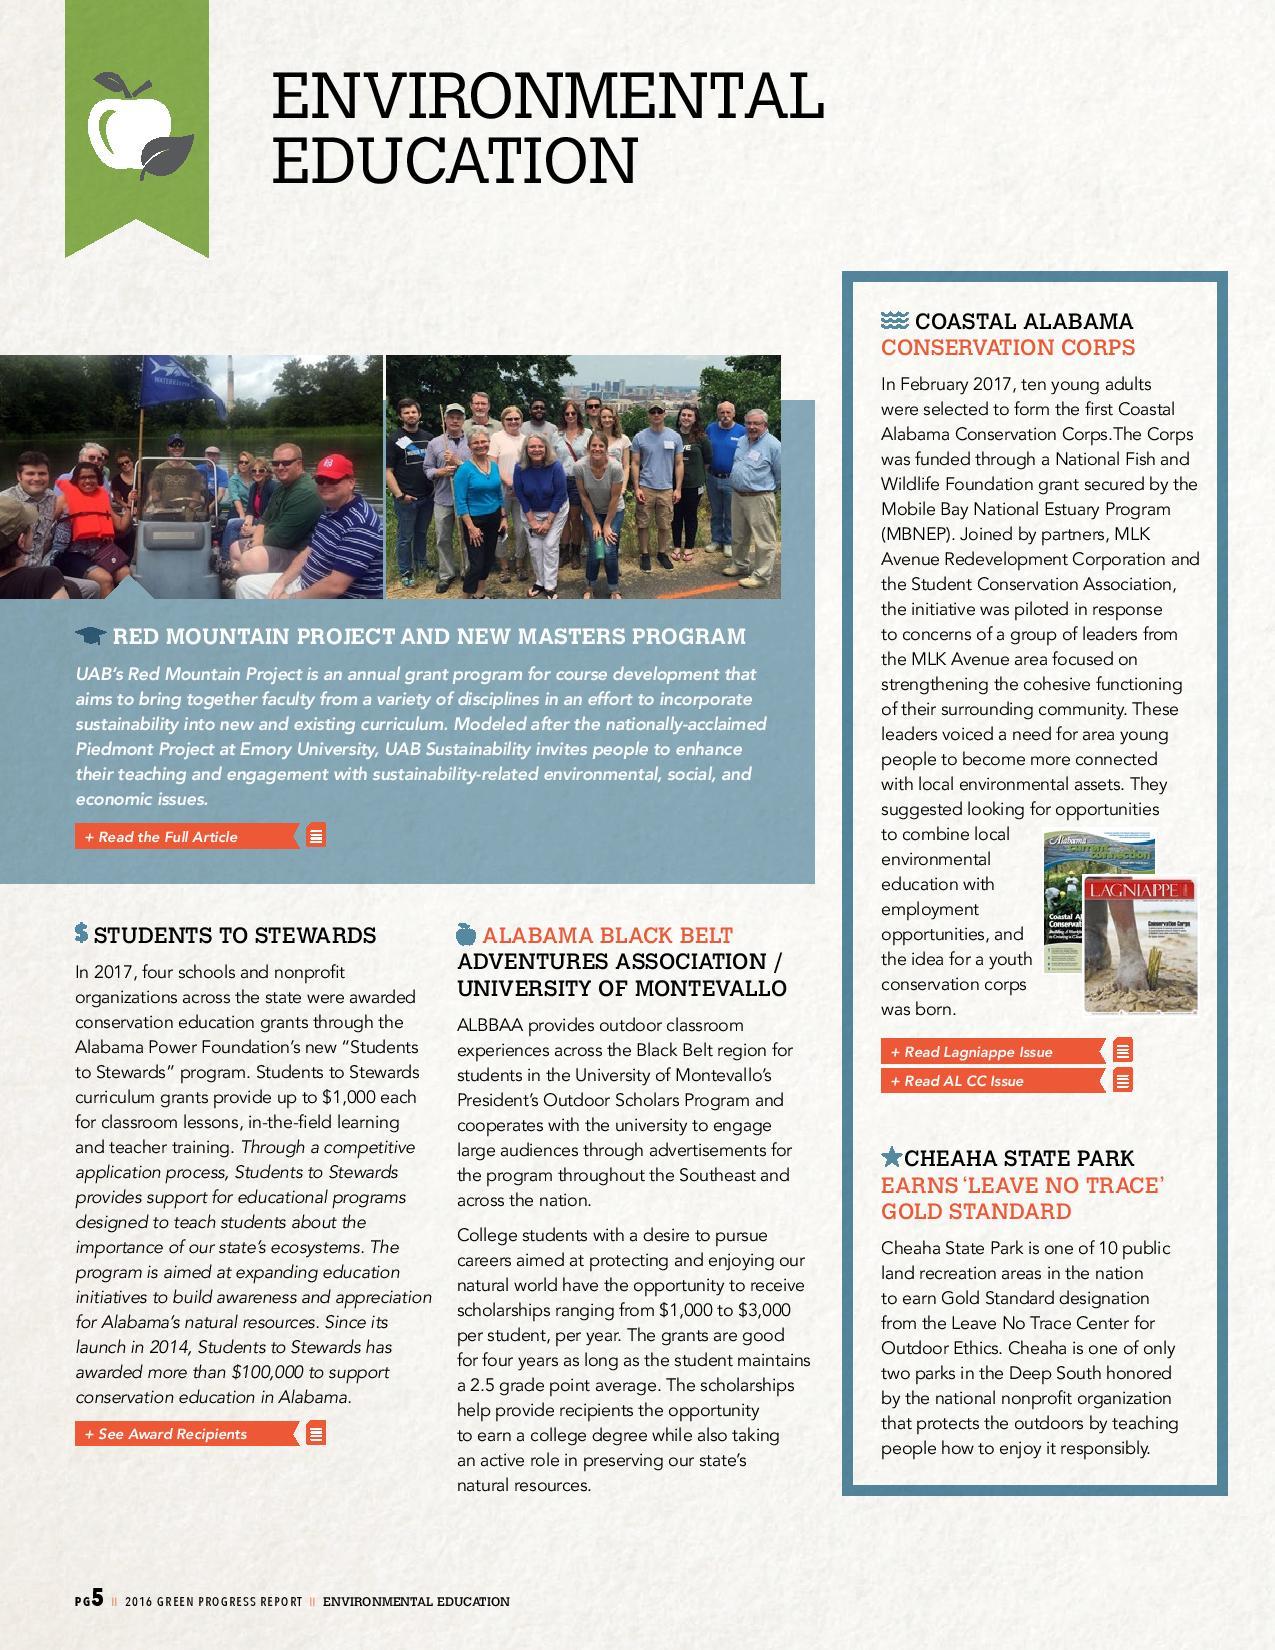 2017 Green Progress Report-v2-page-006.jpg